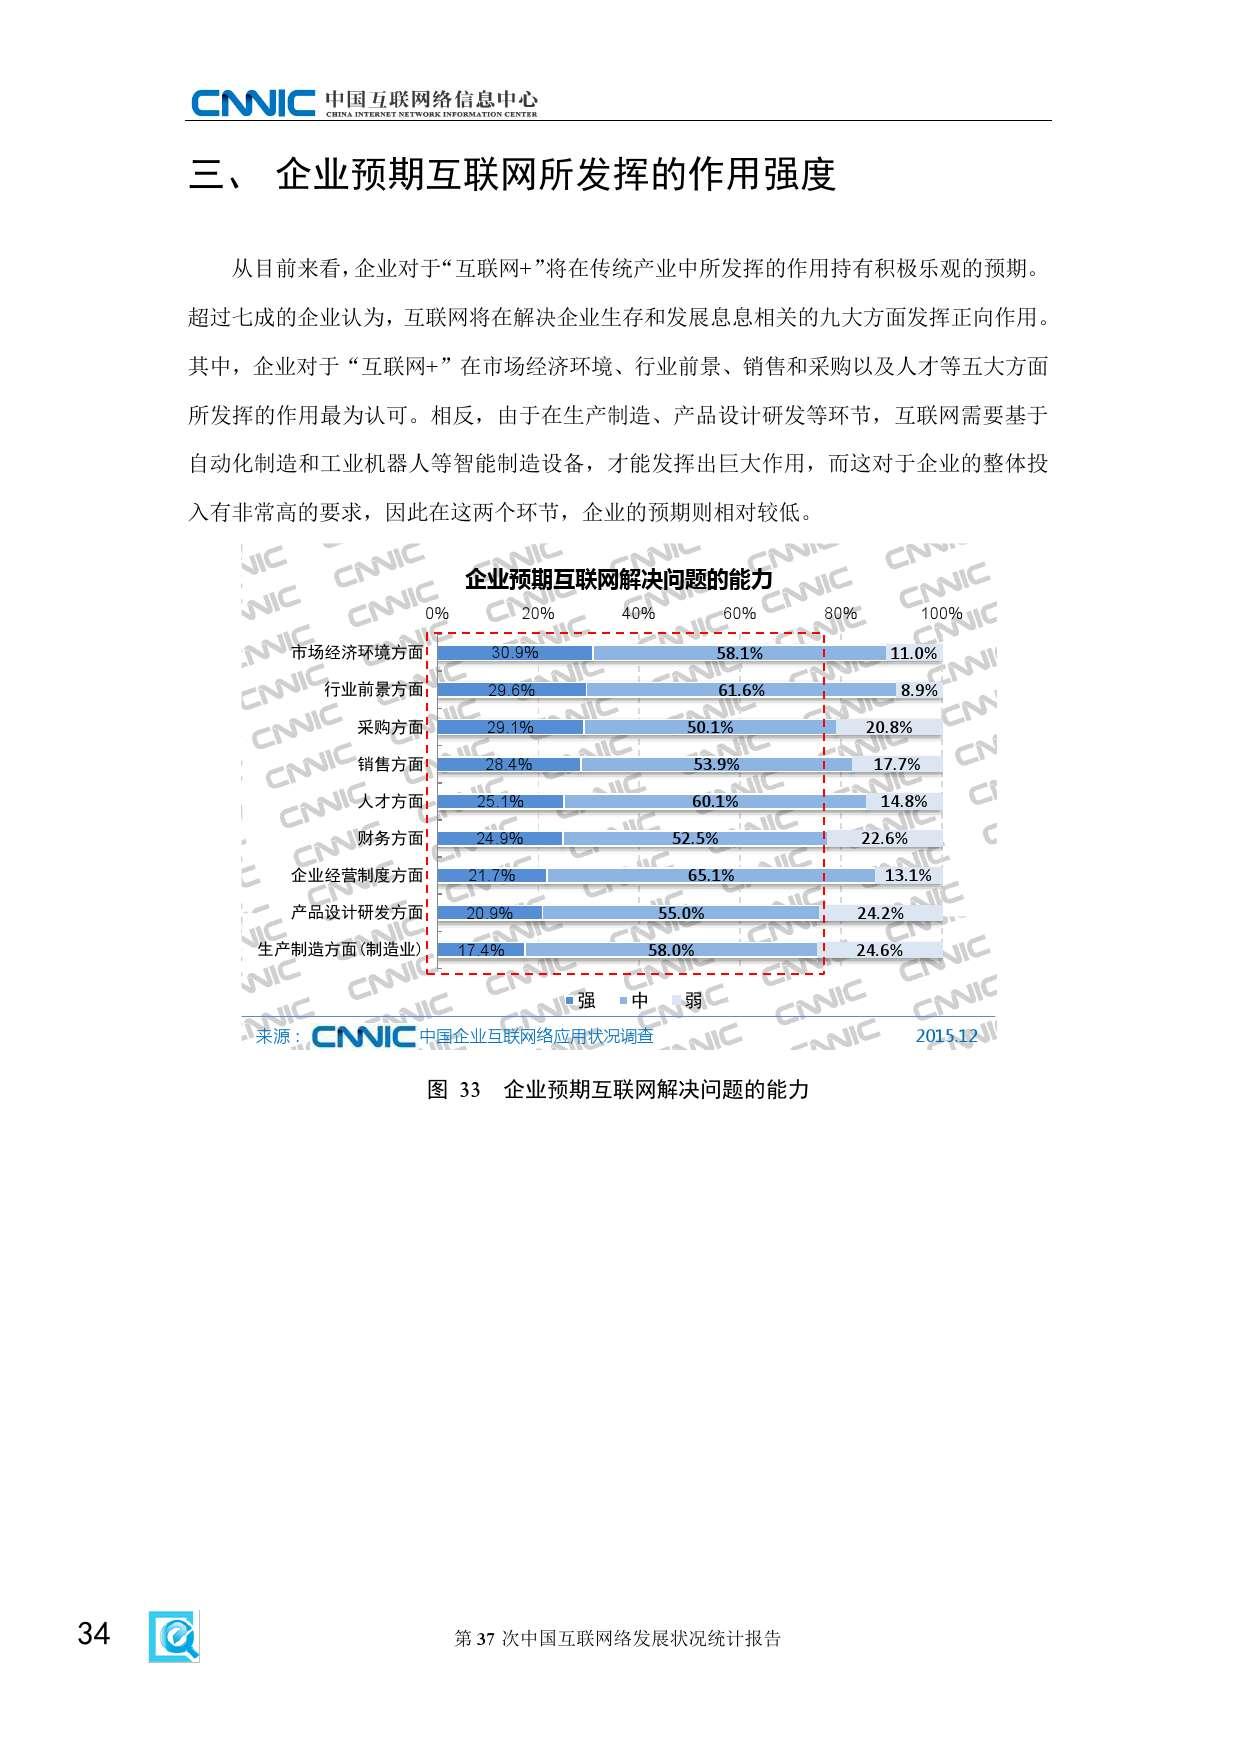 CNNIC:2015年第37次中国互联网络发展状况统计报告_000040